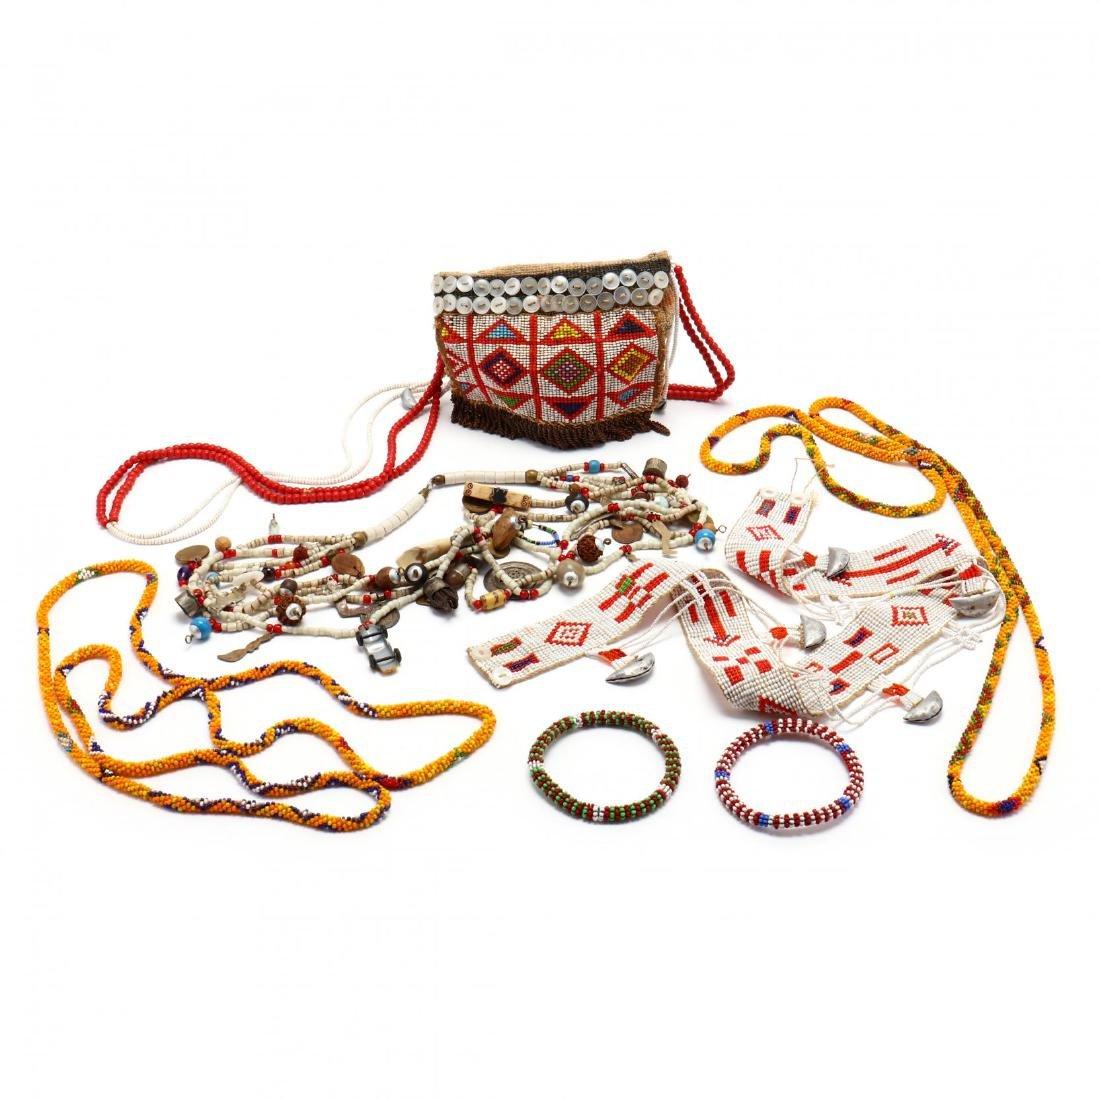 A Kamba Beadwork Collection